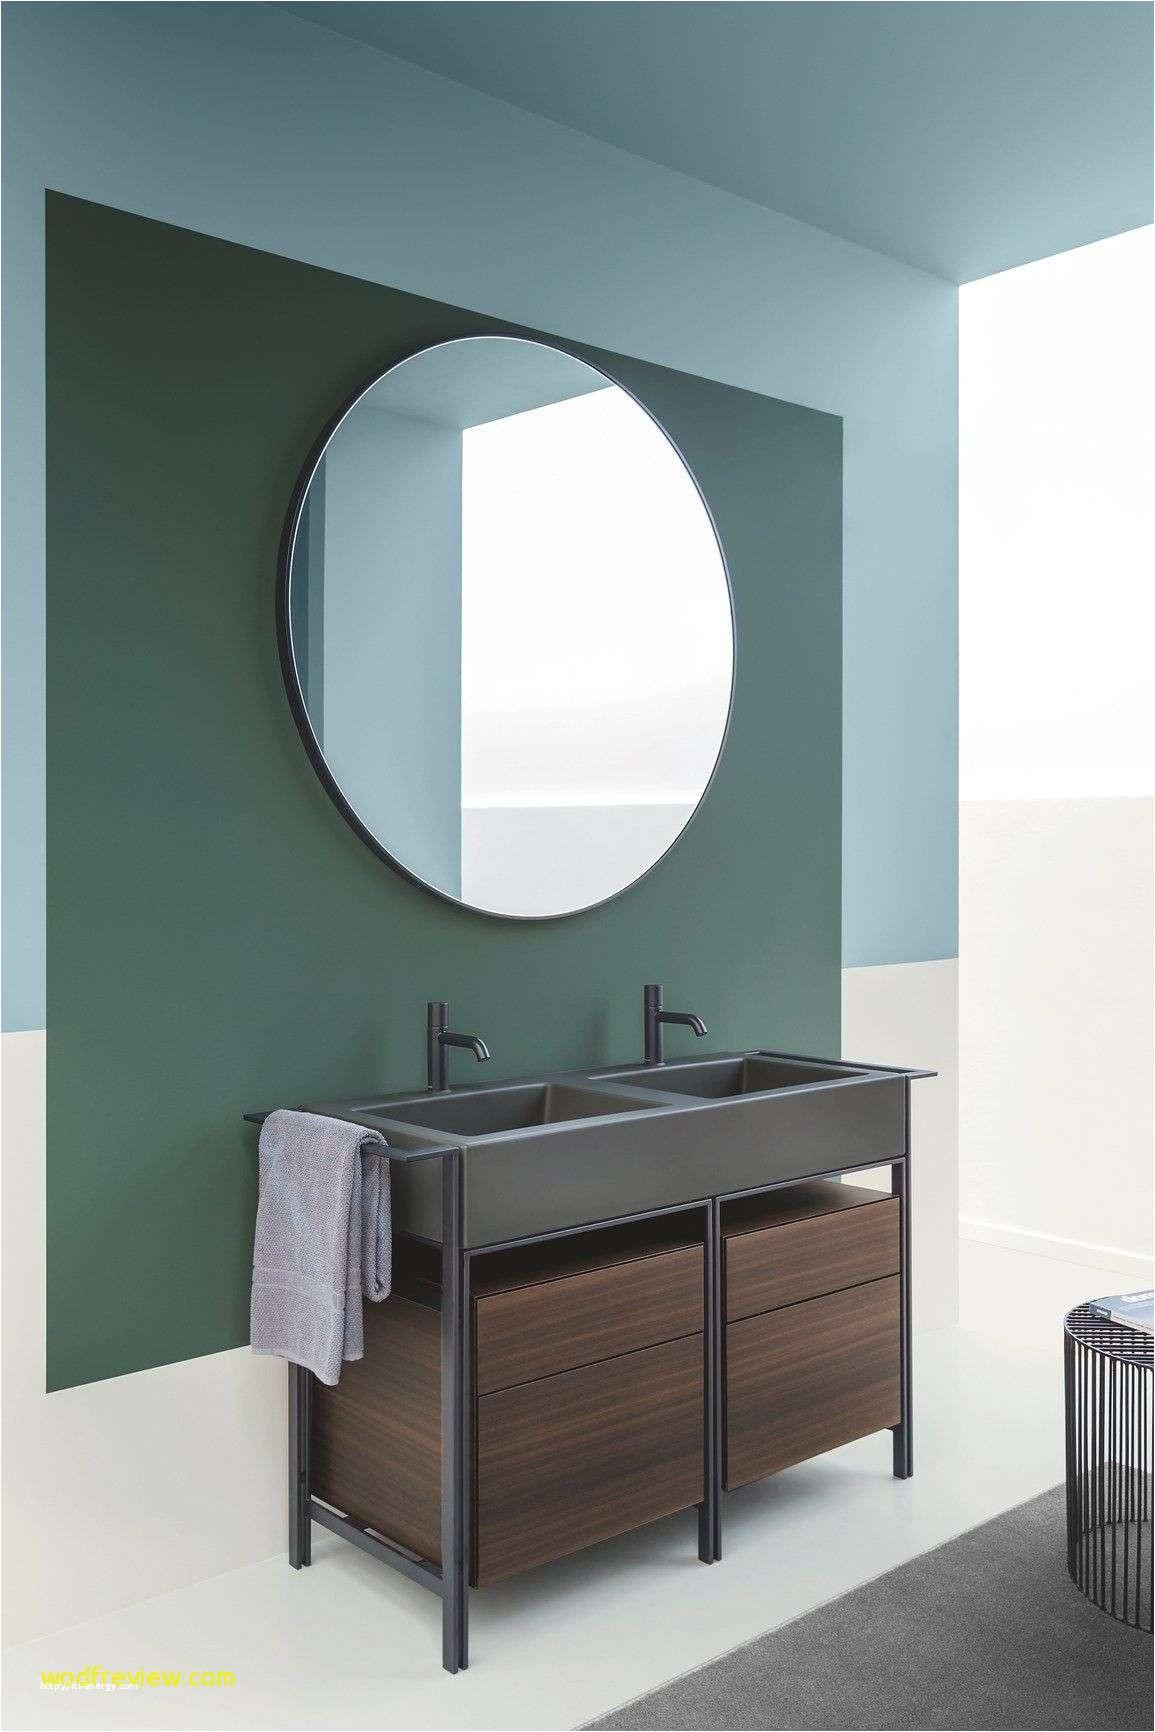 Magnificent Bathroom Design Pinterest Bathroom Ideas 2018 Pinterest Bathroom Ideas 0d Tag Elegant Bathroom